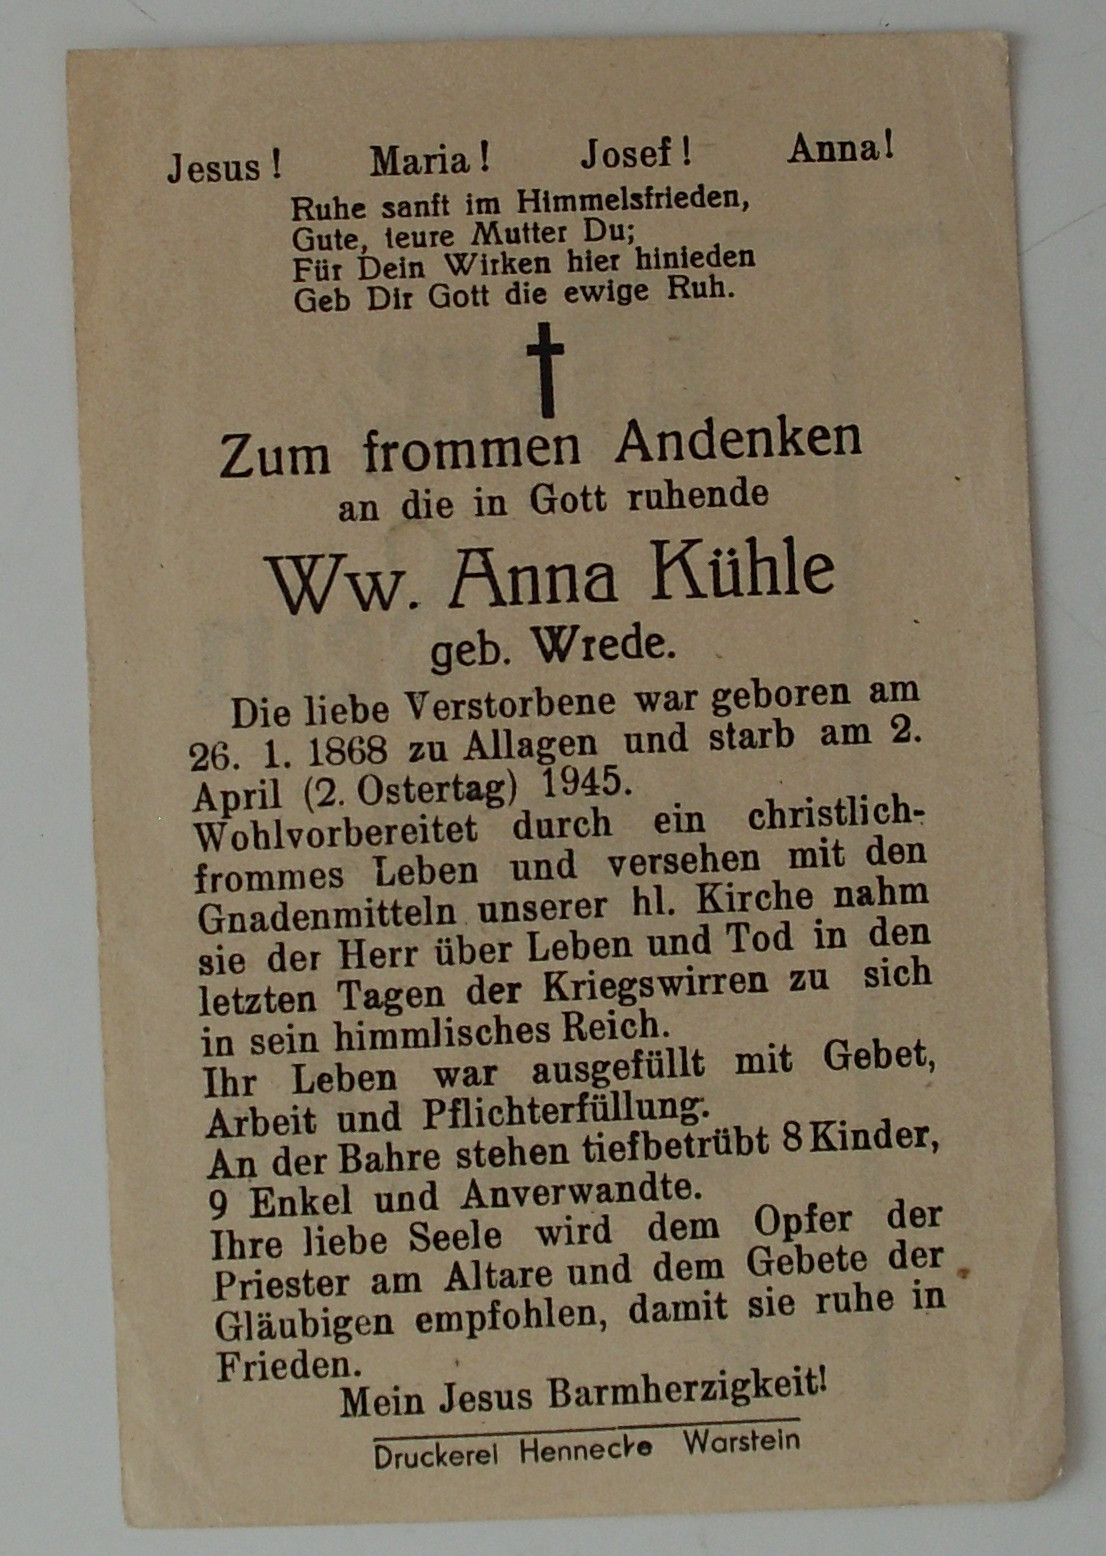 TZ_Wrede_Anna_Kühle